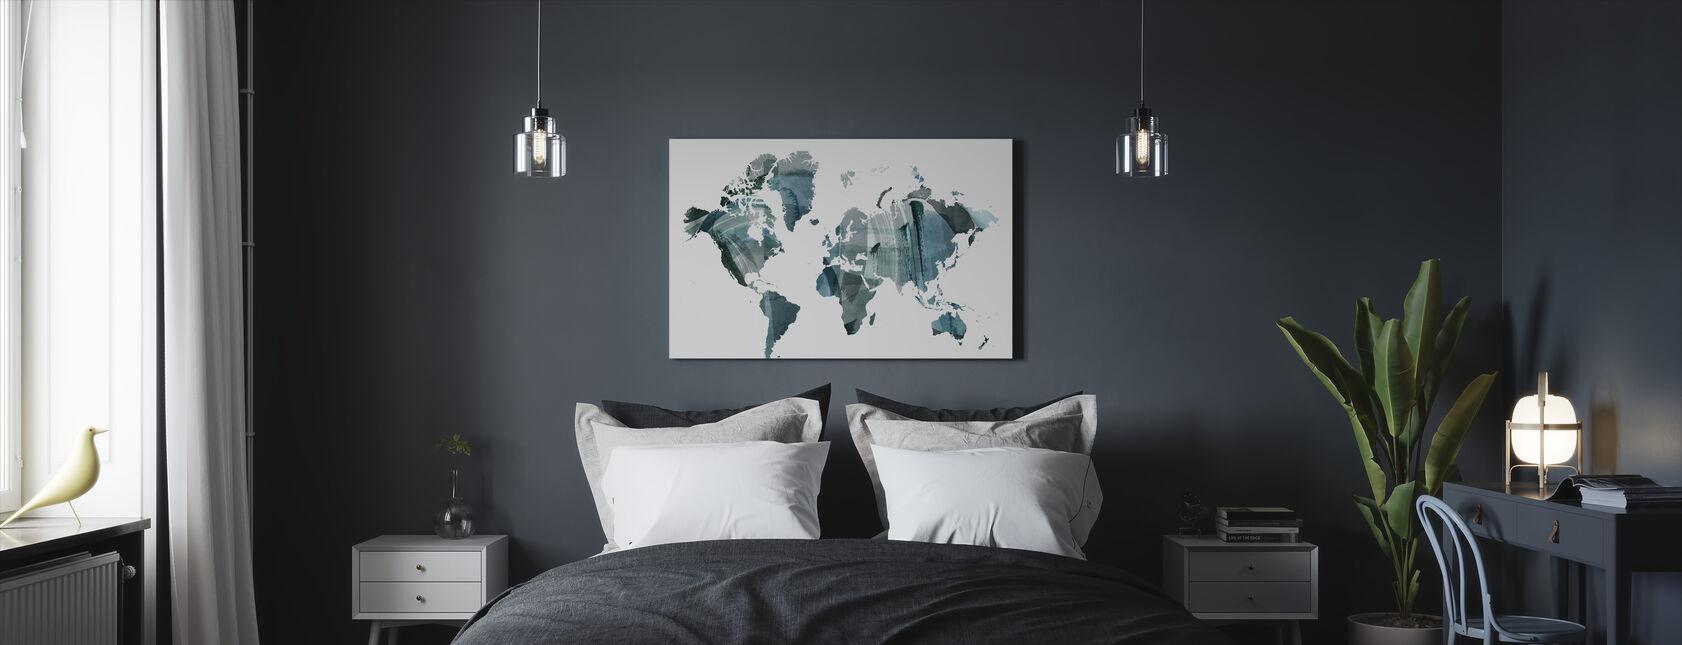 Wash Mundial - Lienzo - Dormitorio